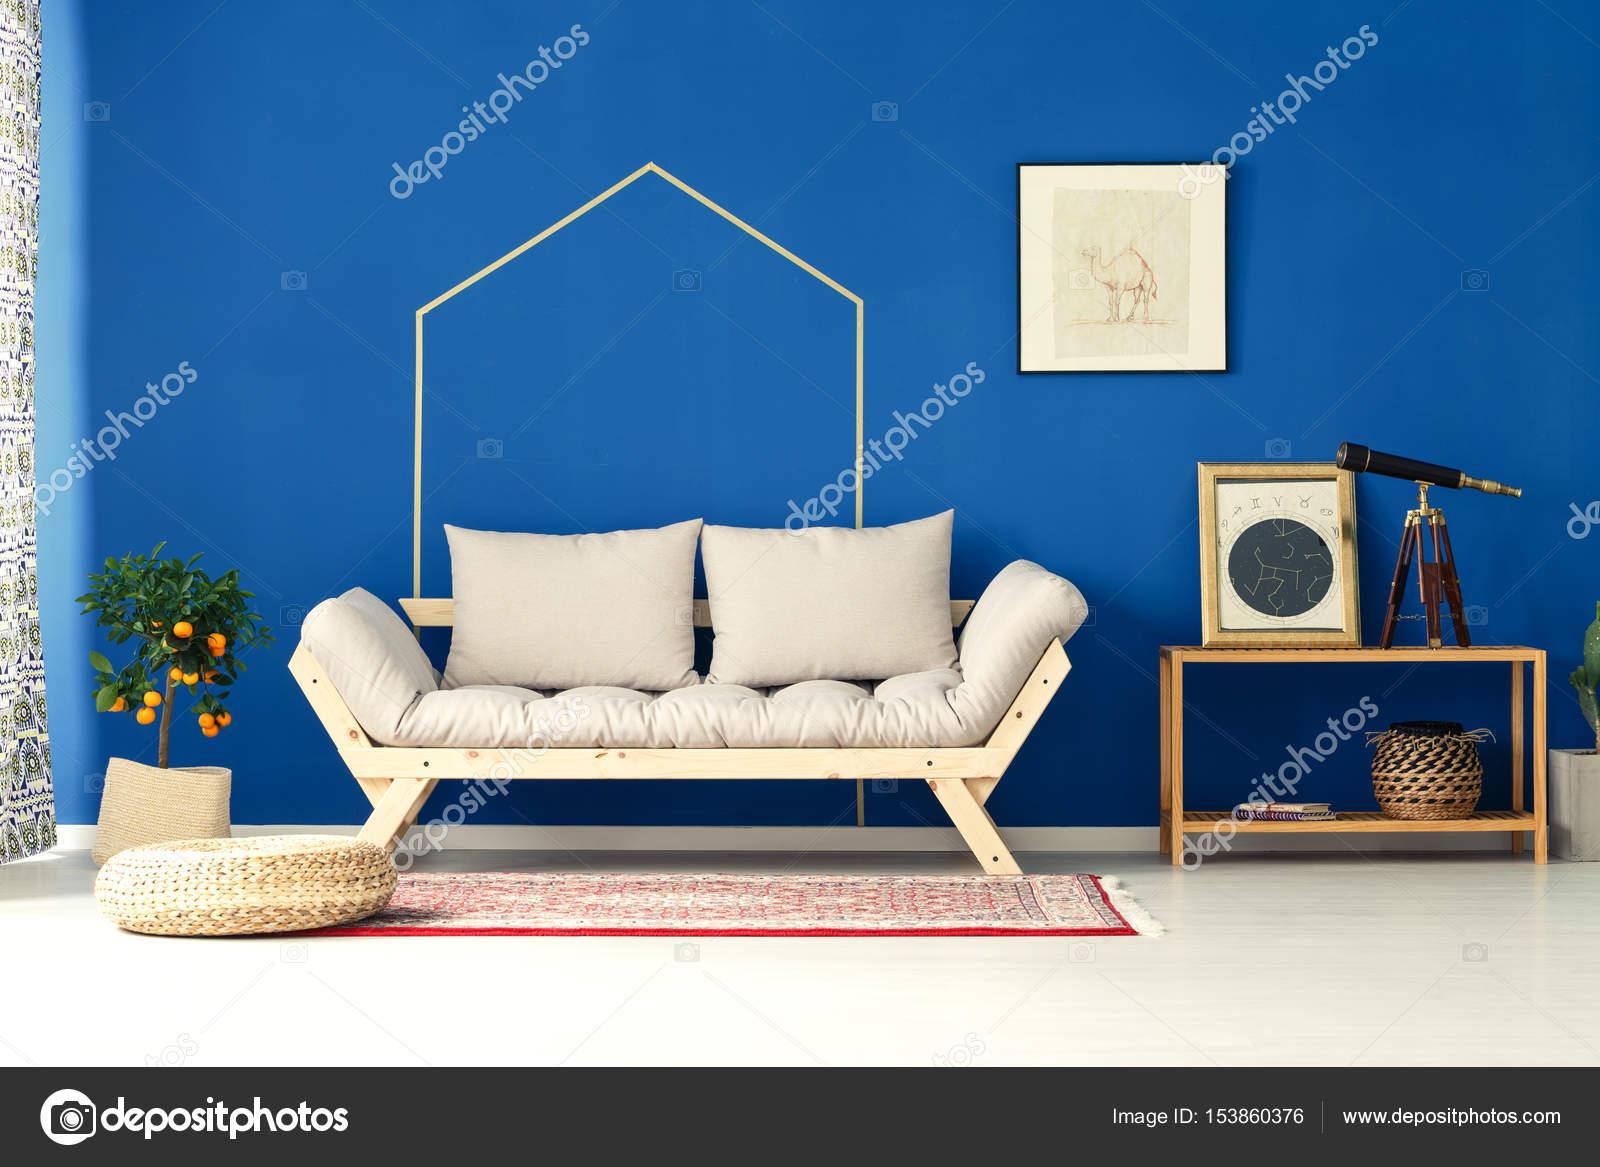 Woonkamer met blauwe muur — Stockfoto © photographee.eu #153860376